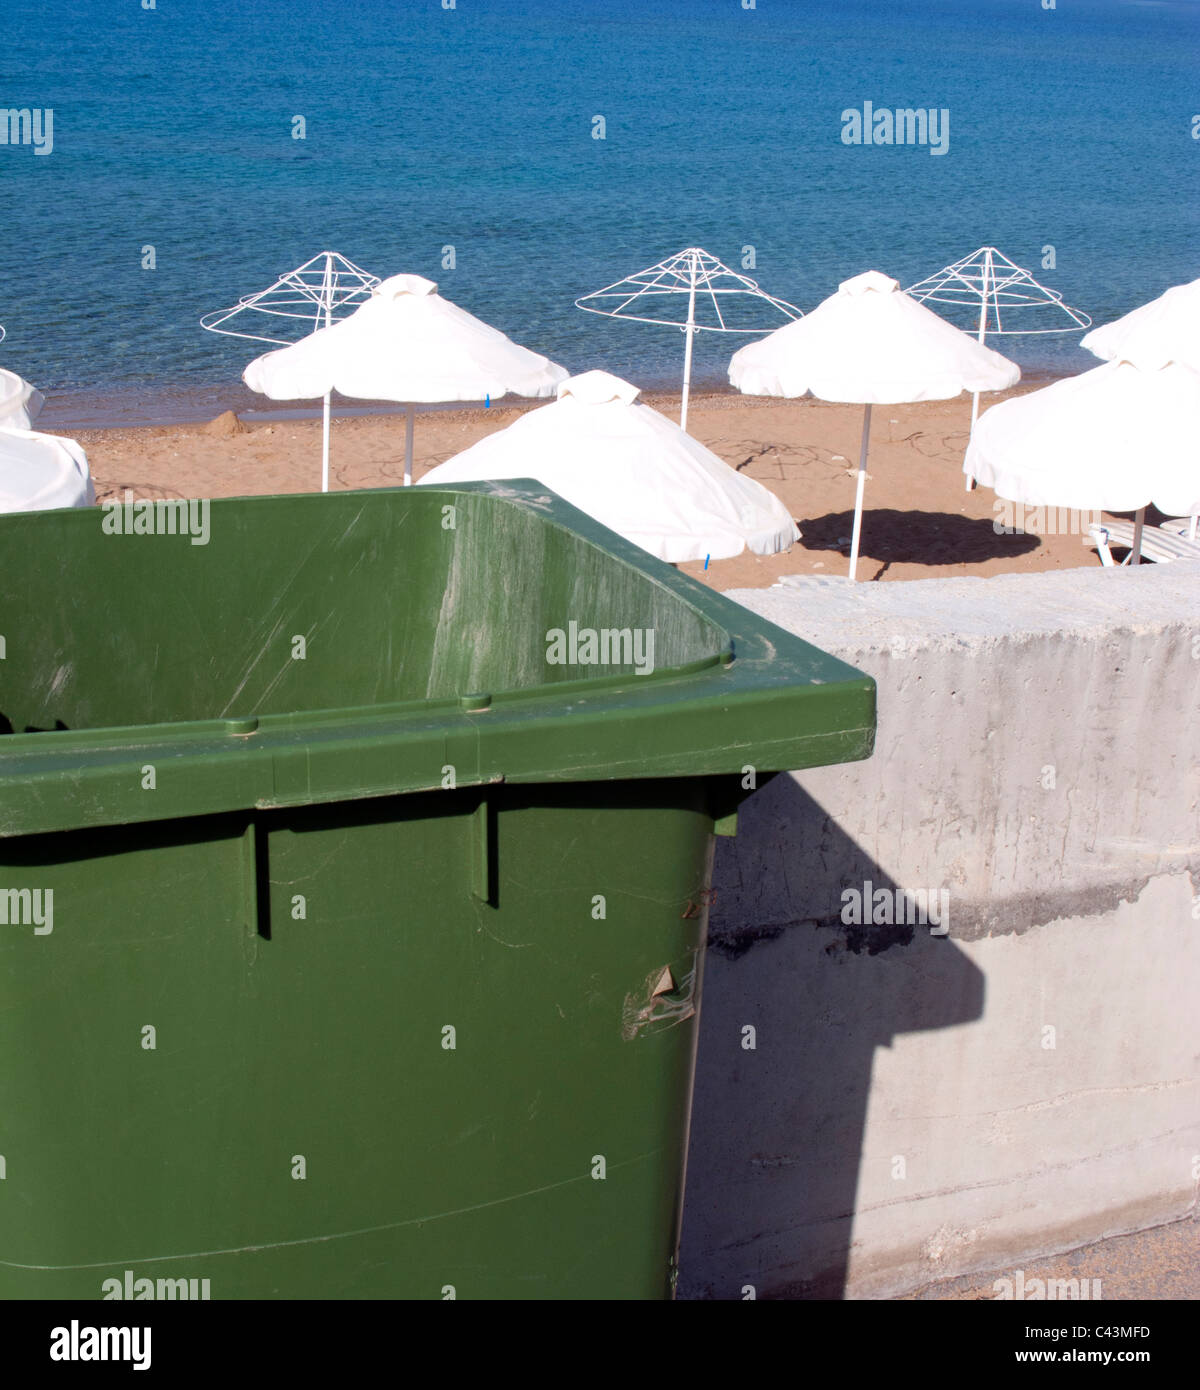 GREEN RUBBISH BIN BESIDE AN EMPTY BEACH IN GREECE Stock Photo